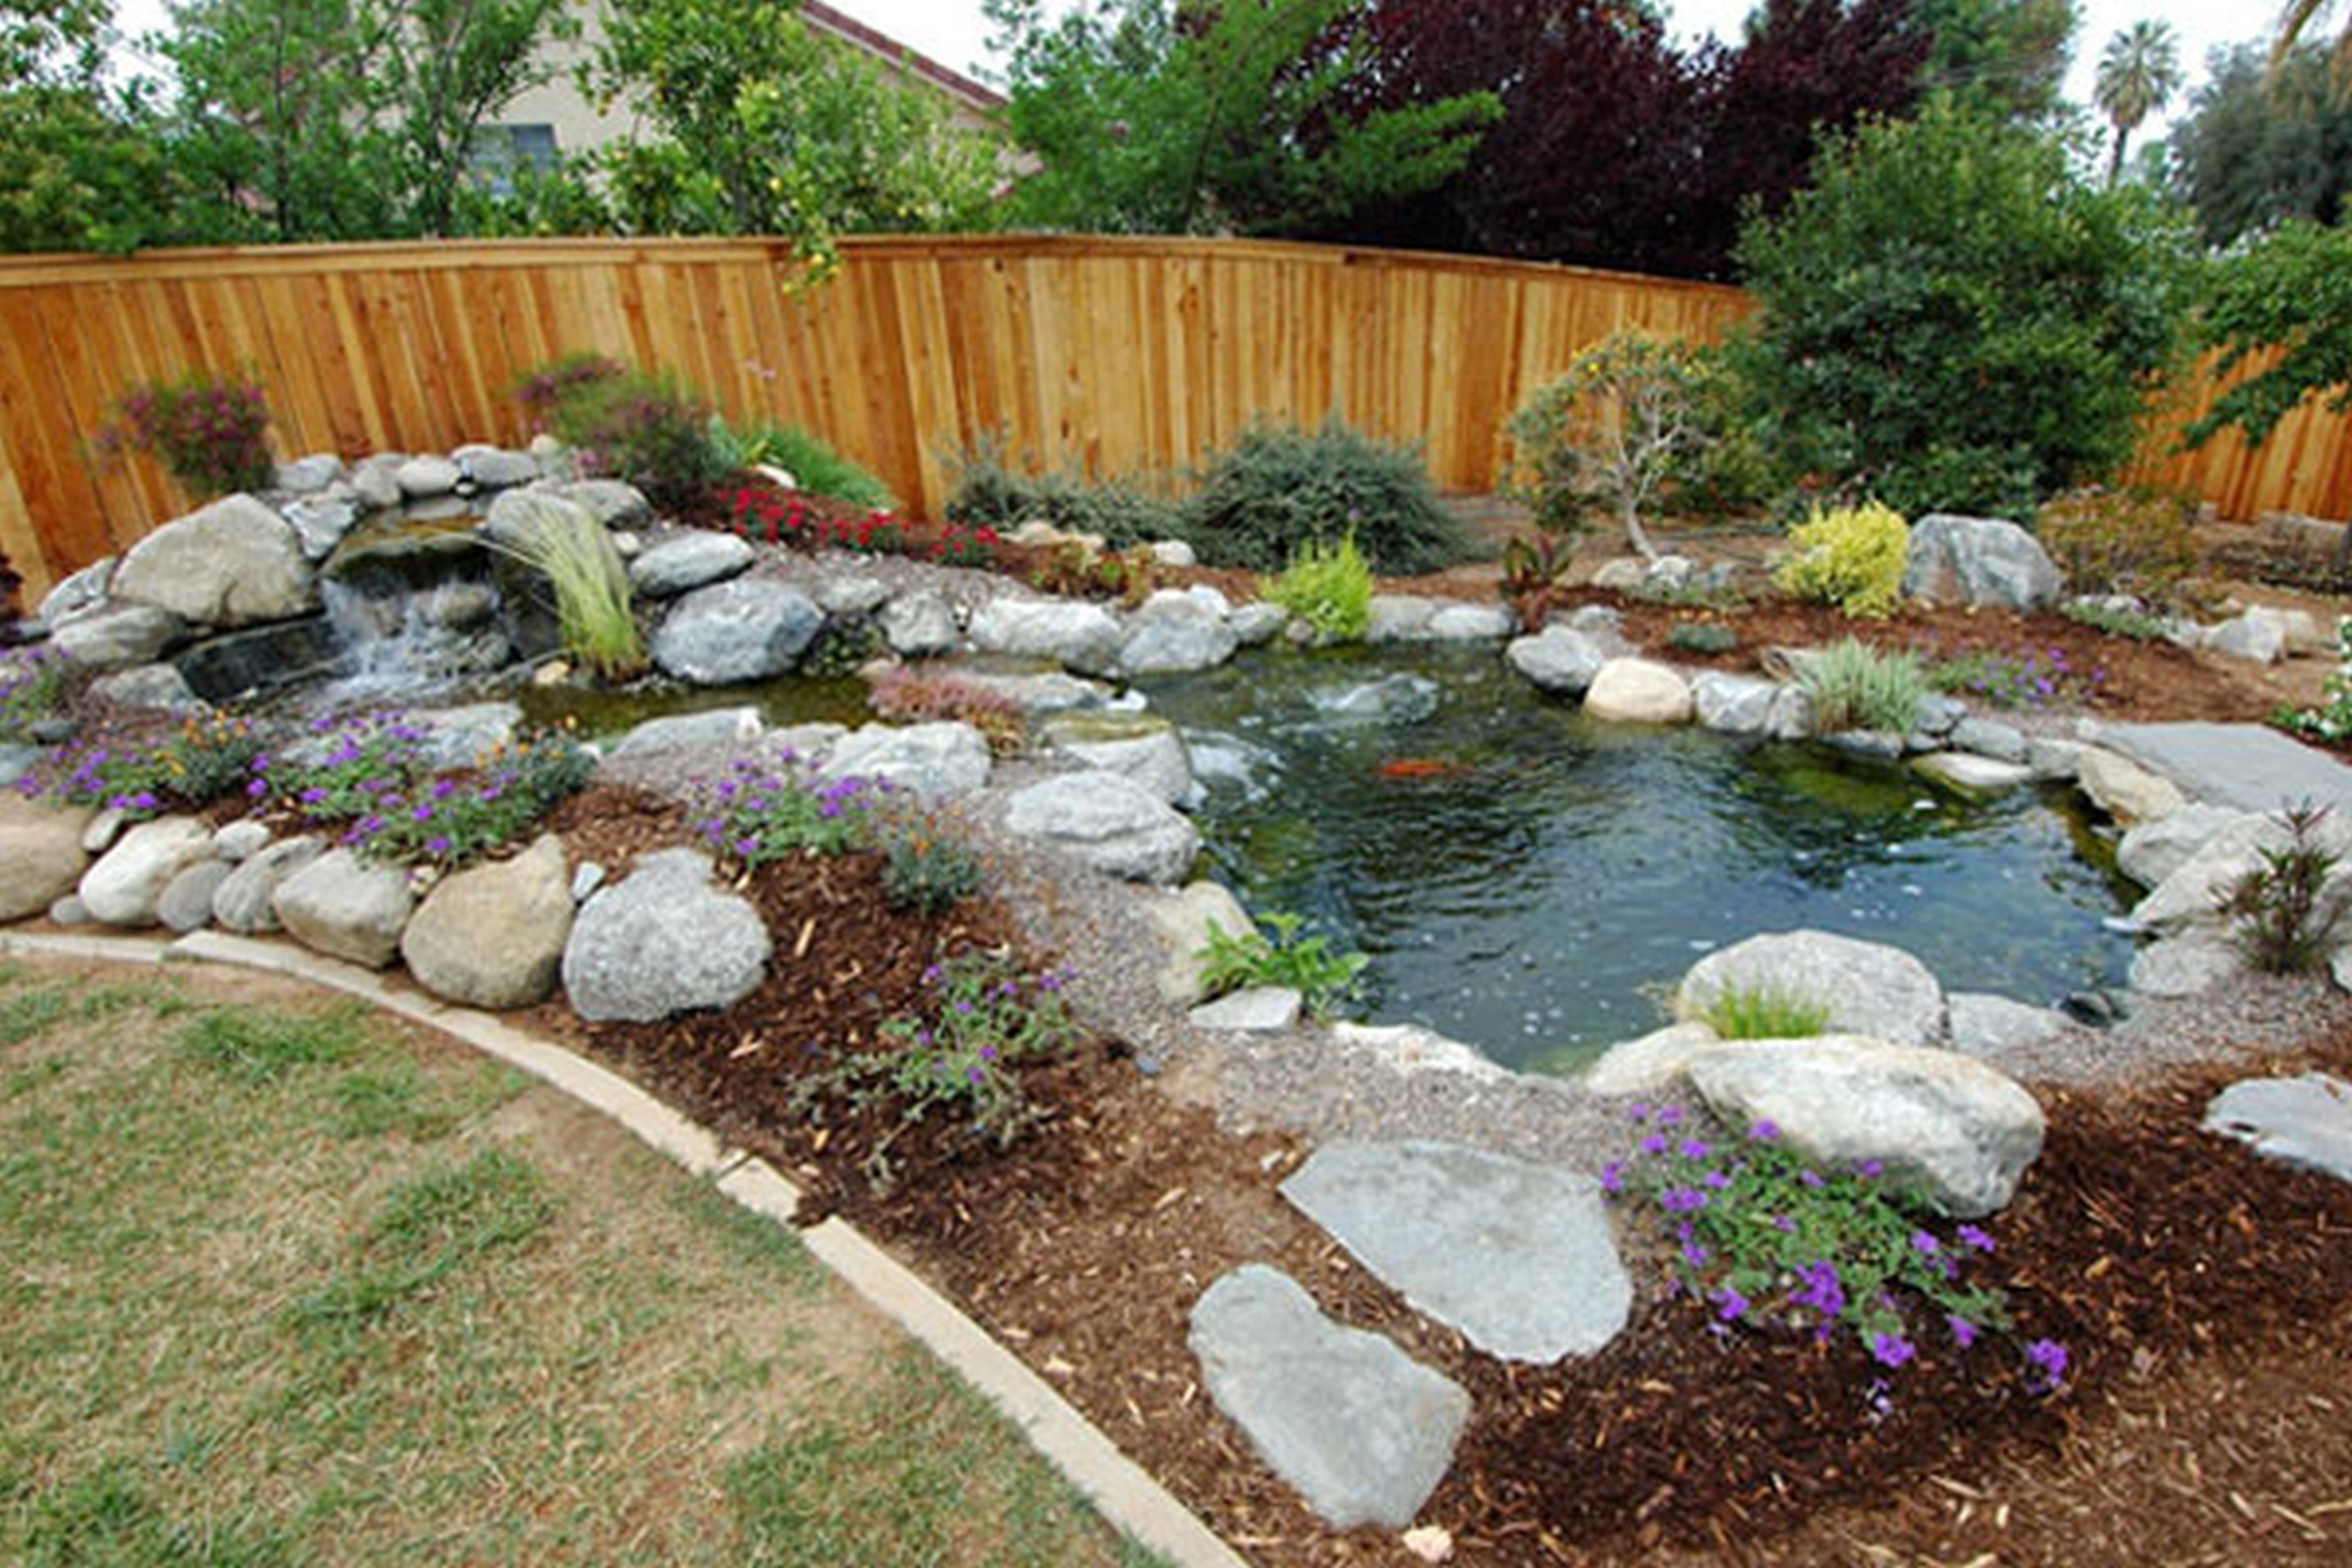 Exterior Small Backyard Landscaping Ideas Desert ... on Desert Landscape Ideas For Backyards id=76534